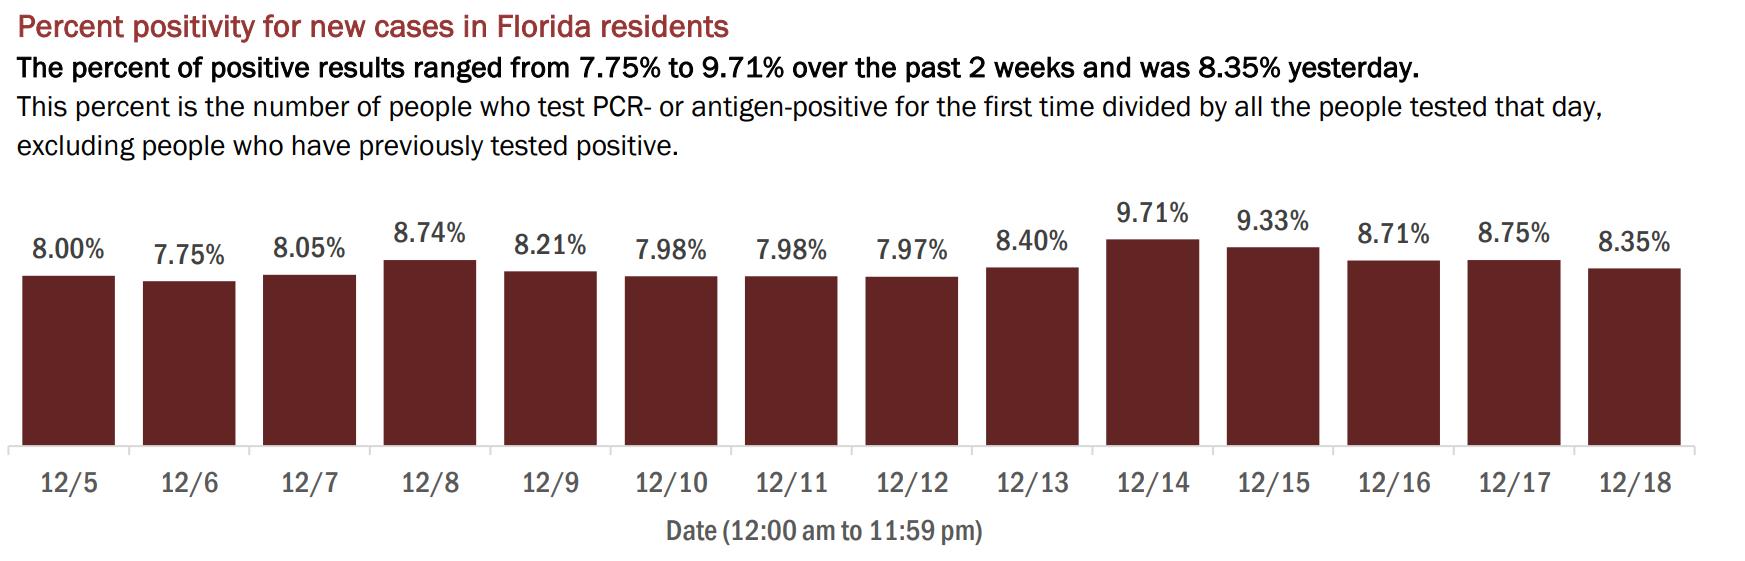 12.19 percent positivity